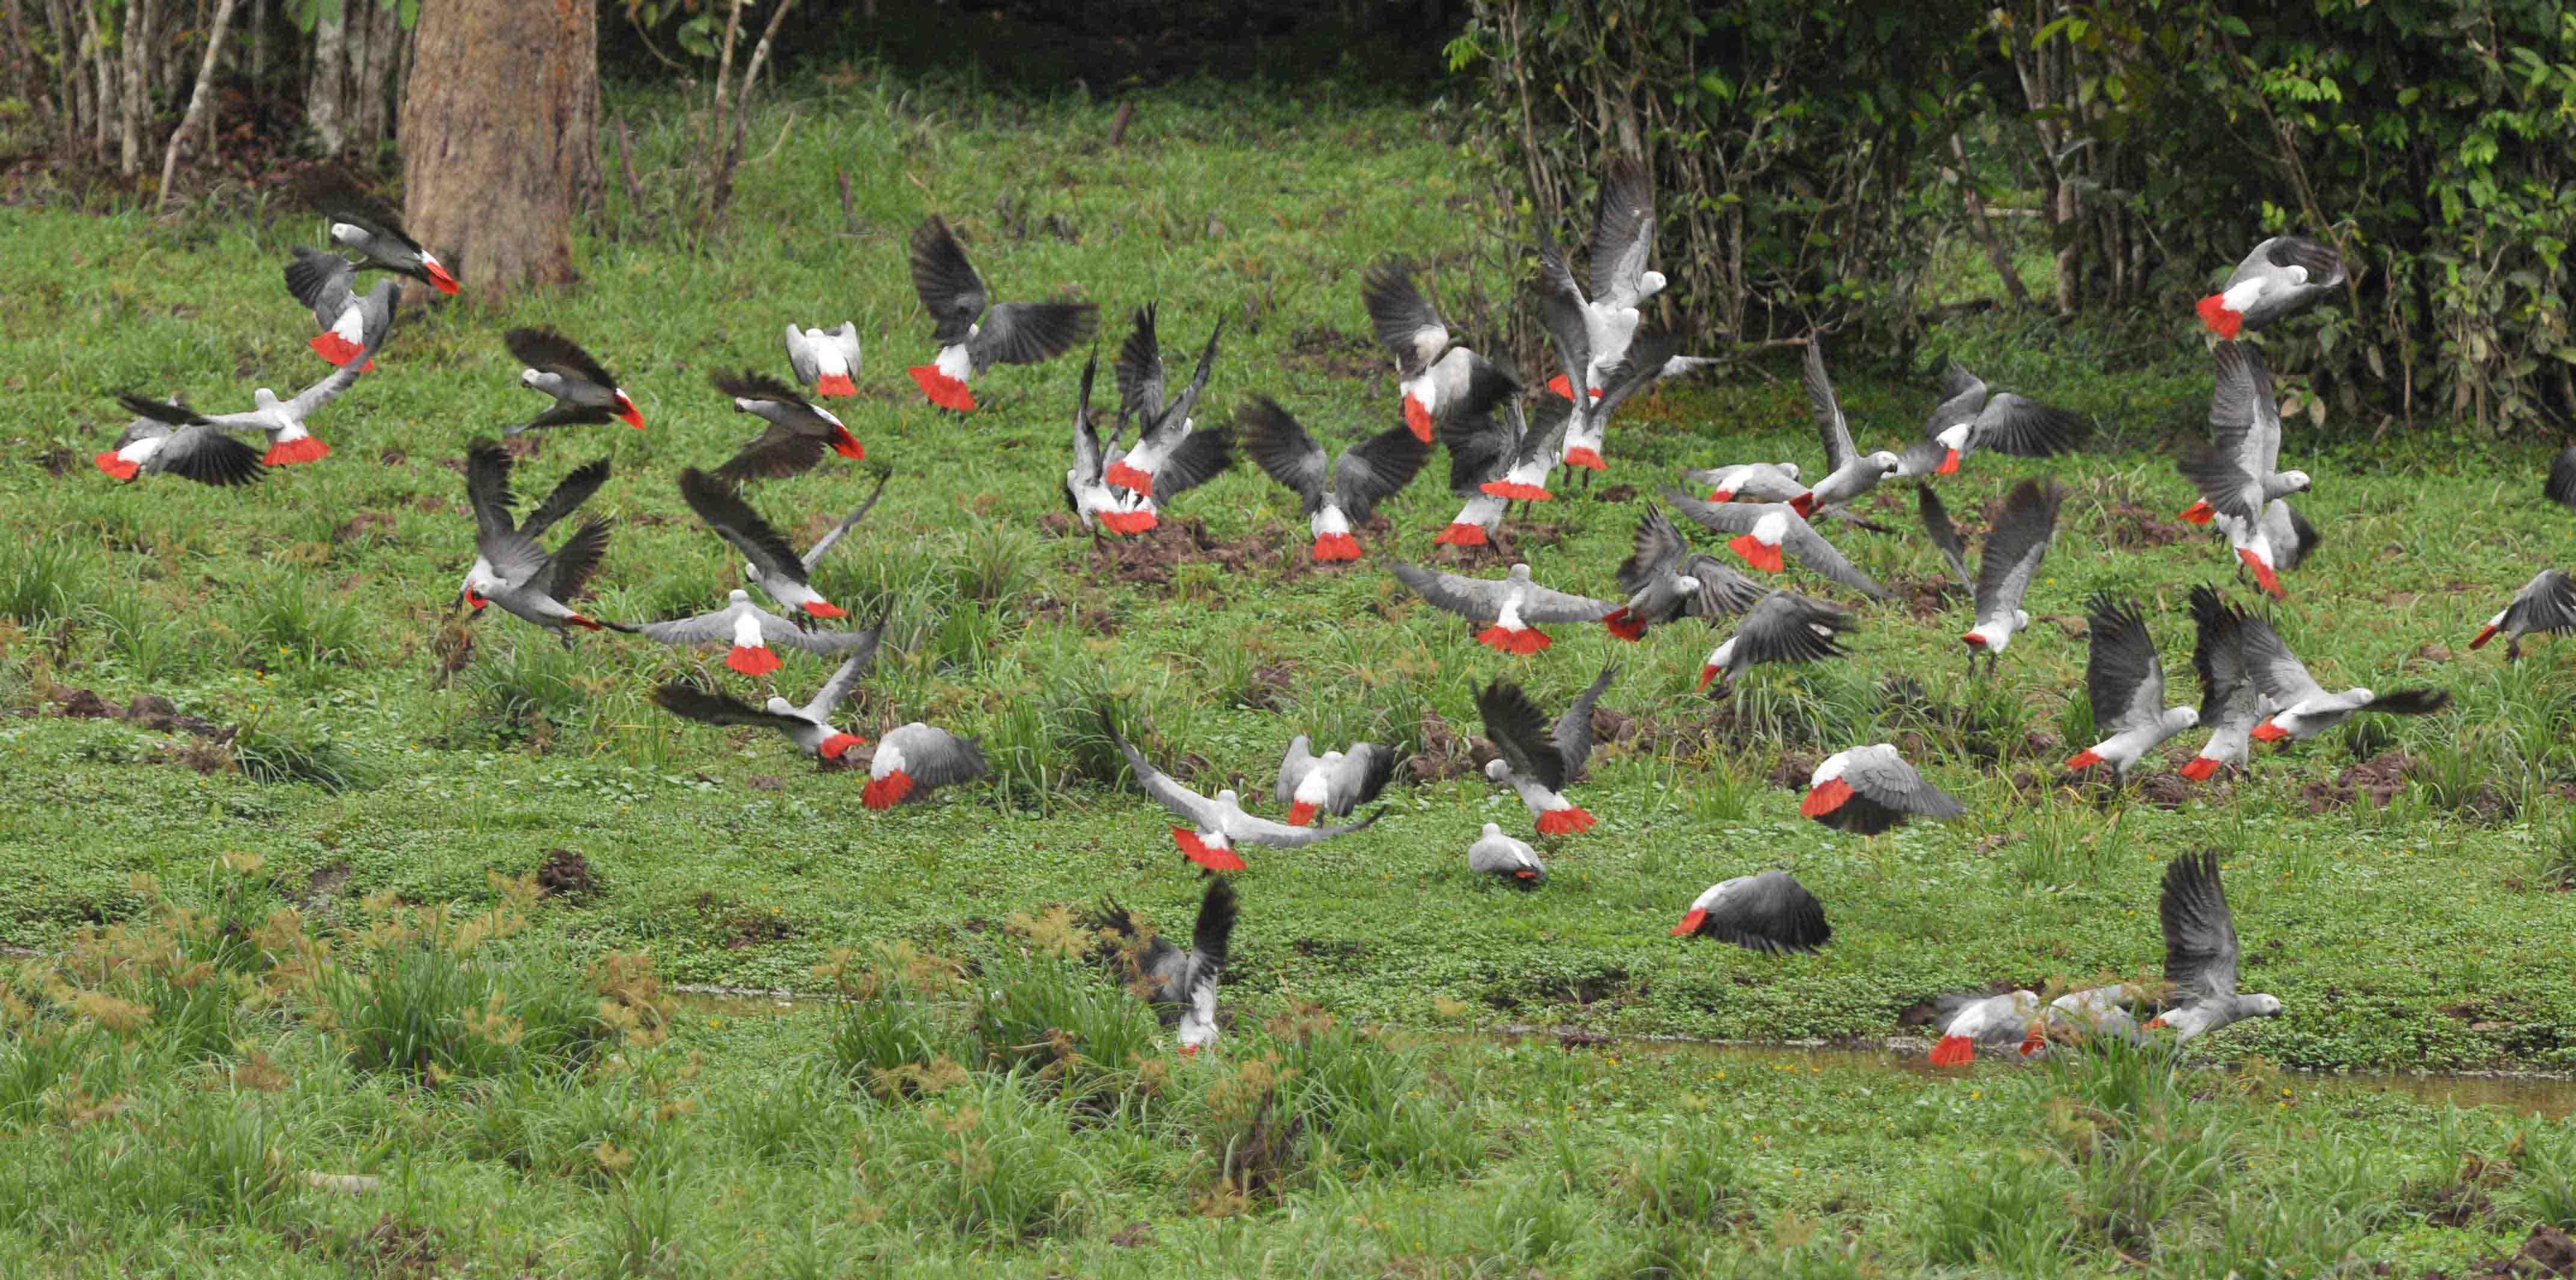 DSC_6833 Grey Parrot Psittacus erithacus Dzanga-Sangha NP Central African Republic (c) Matthias Dehling WWF